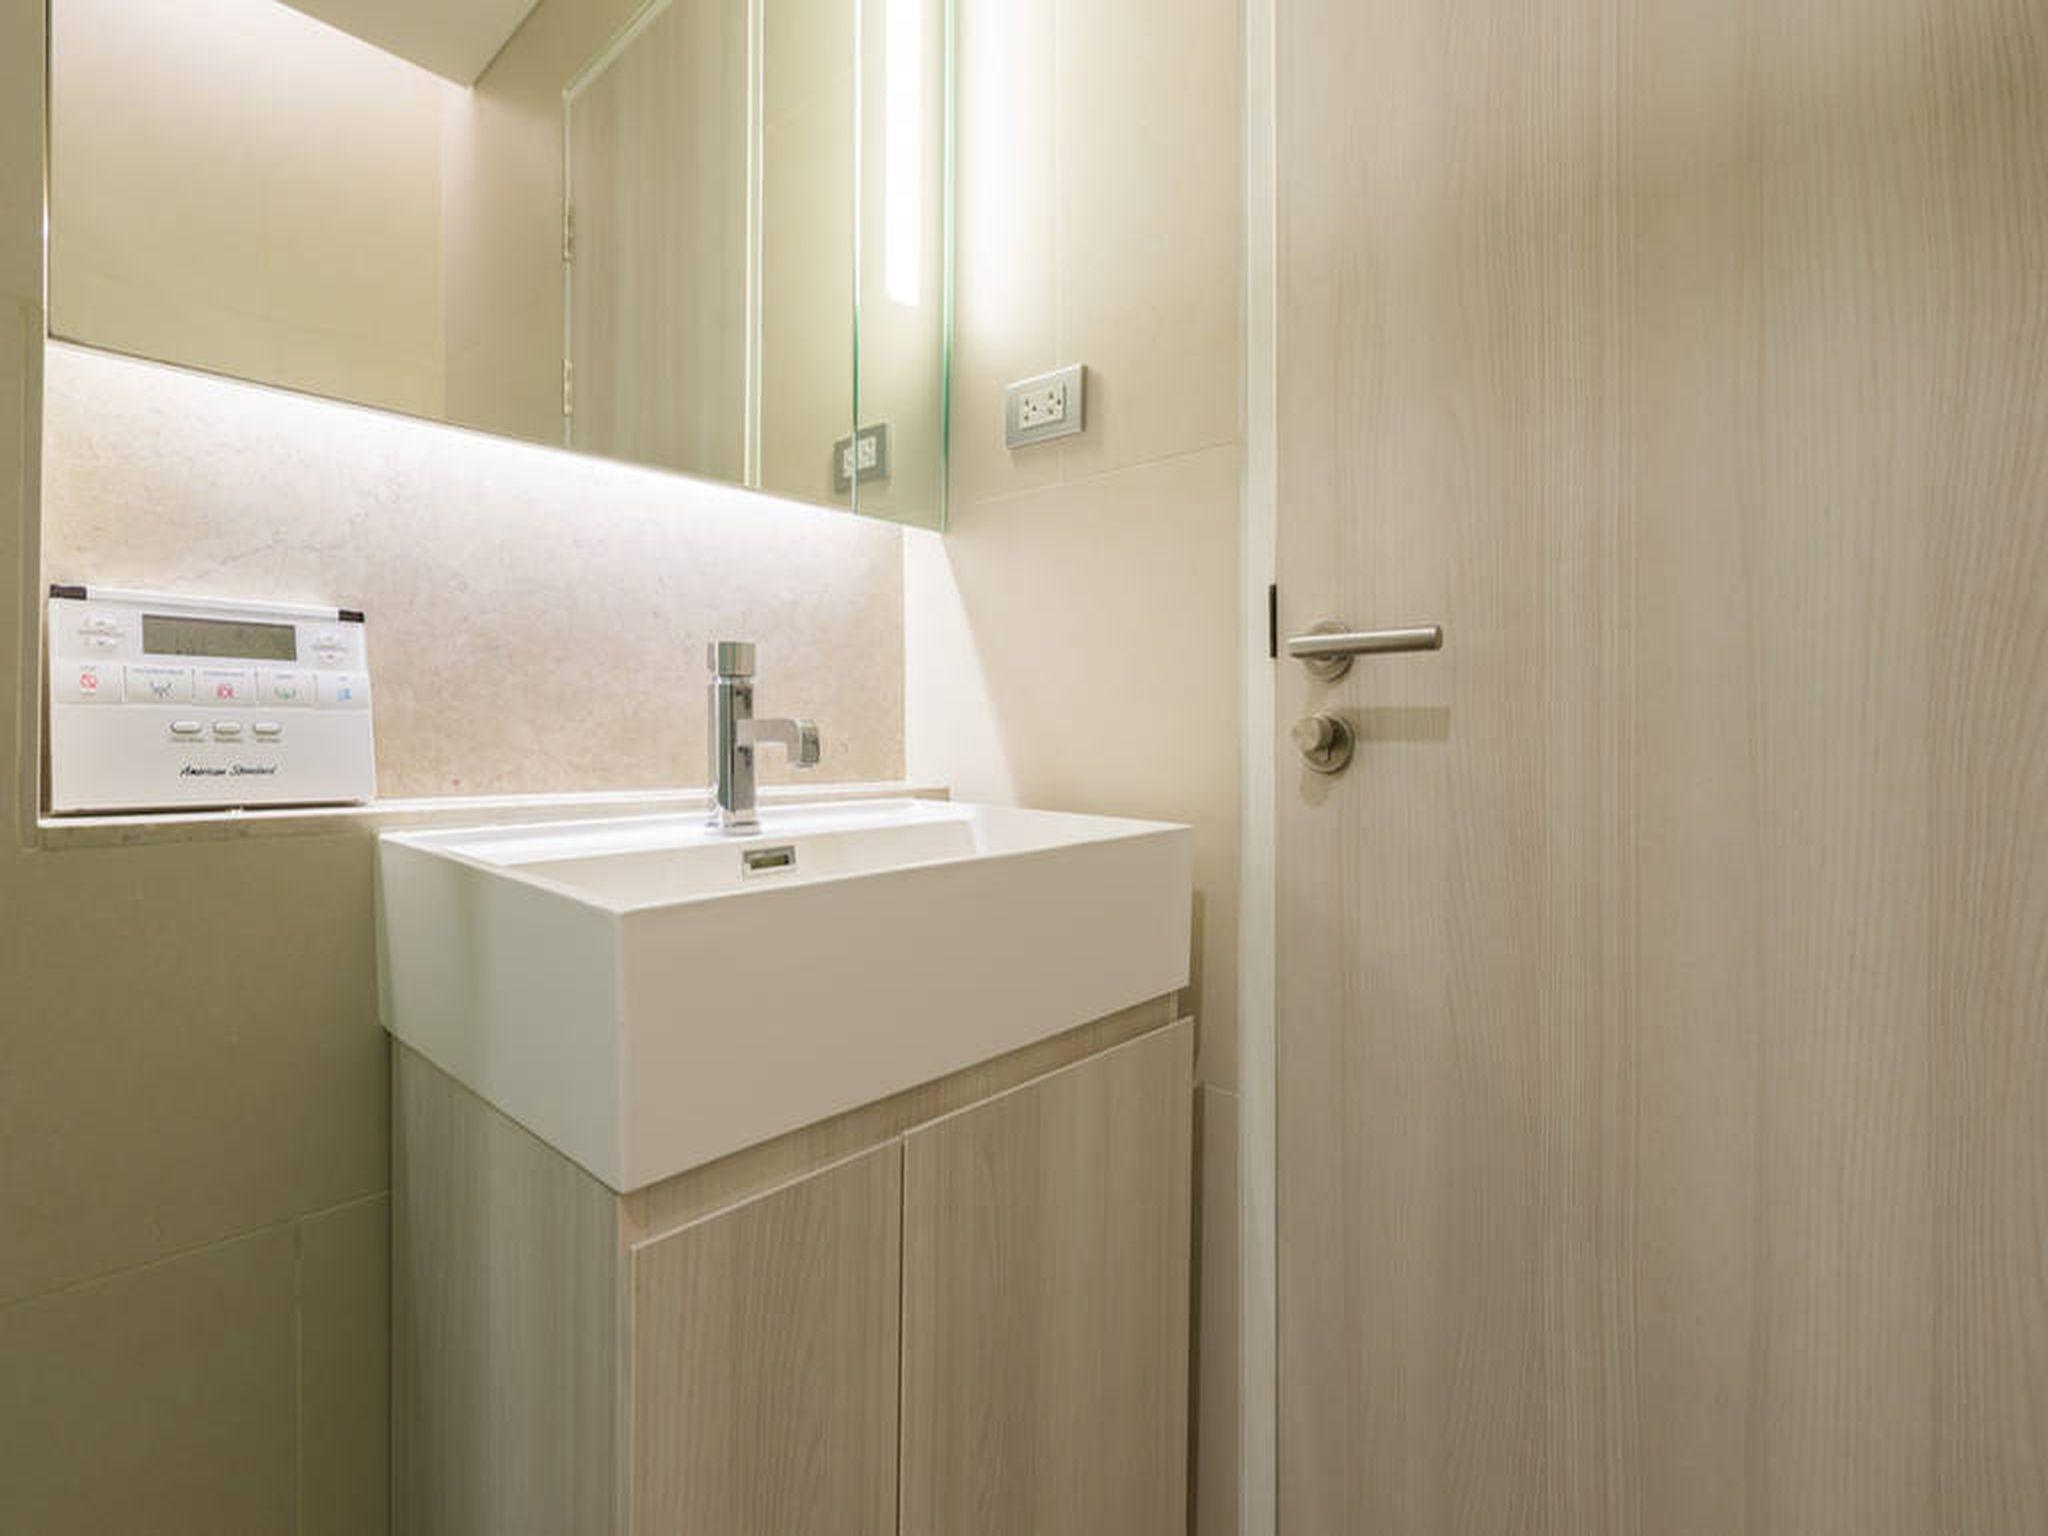 The Sukhumvit24 Executive 2 Bed 2 Bath Free WiFi